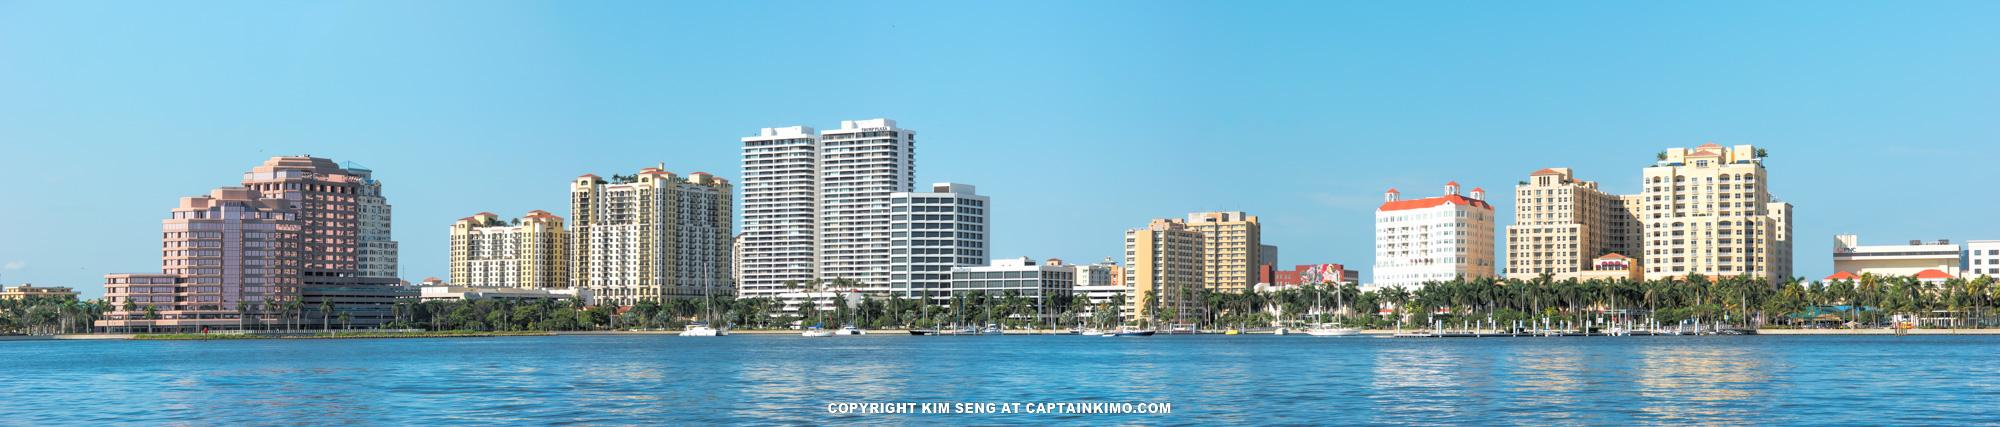 West Palm Beach Skyline Panorama High Resolution